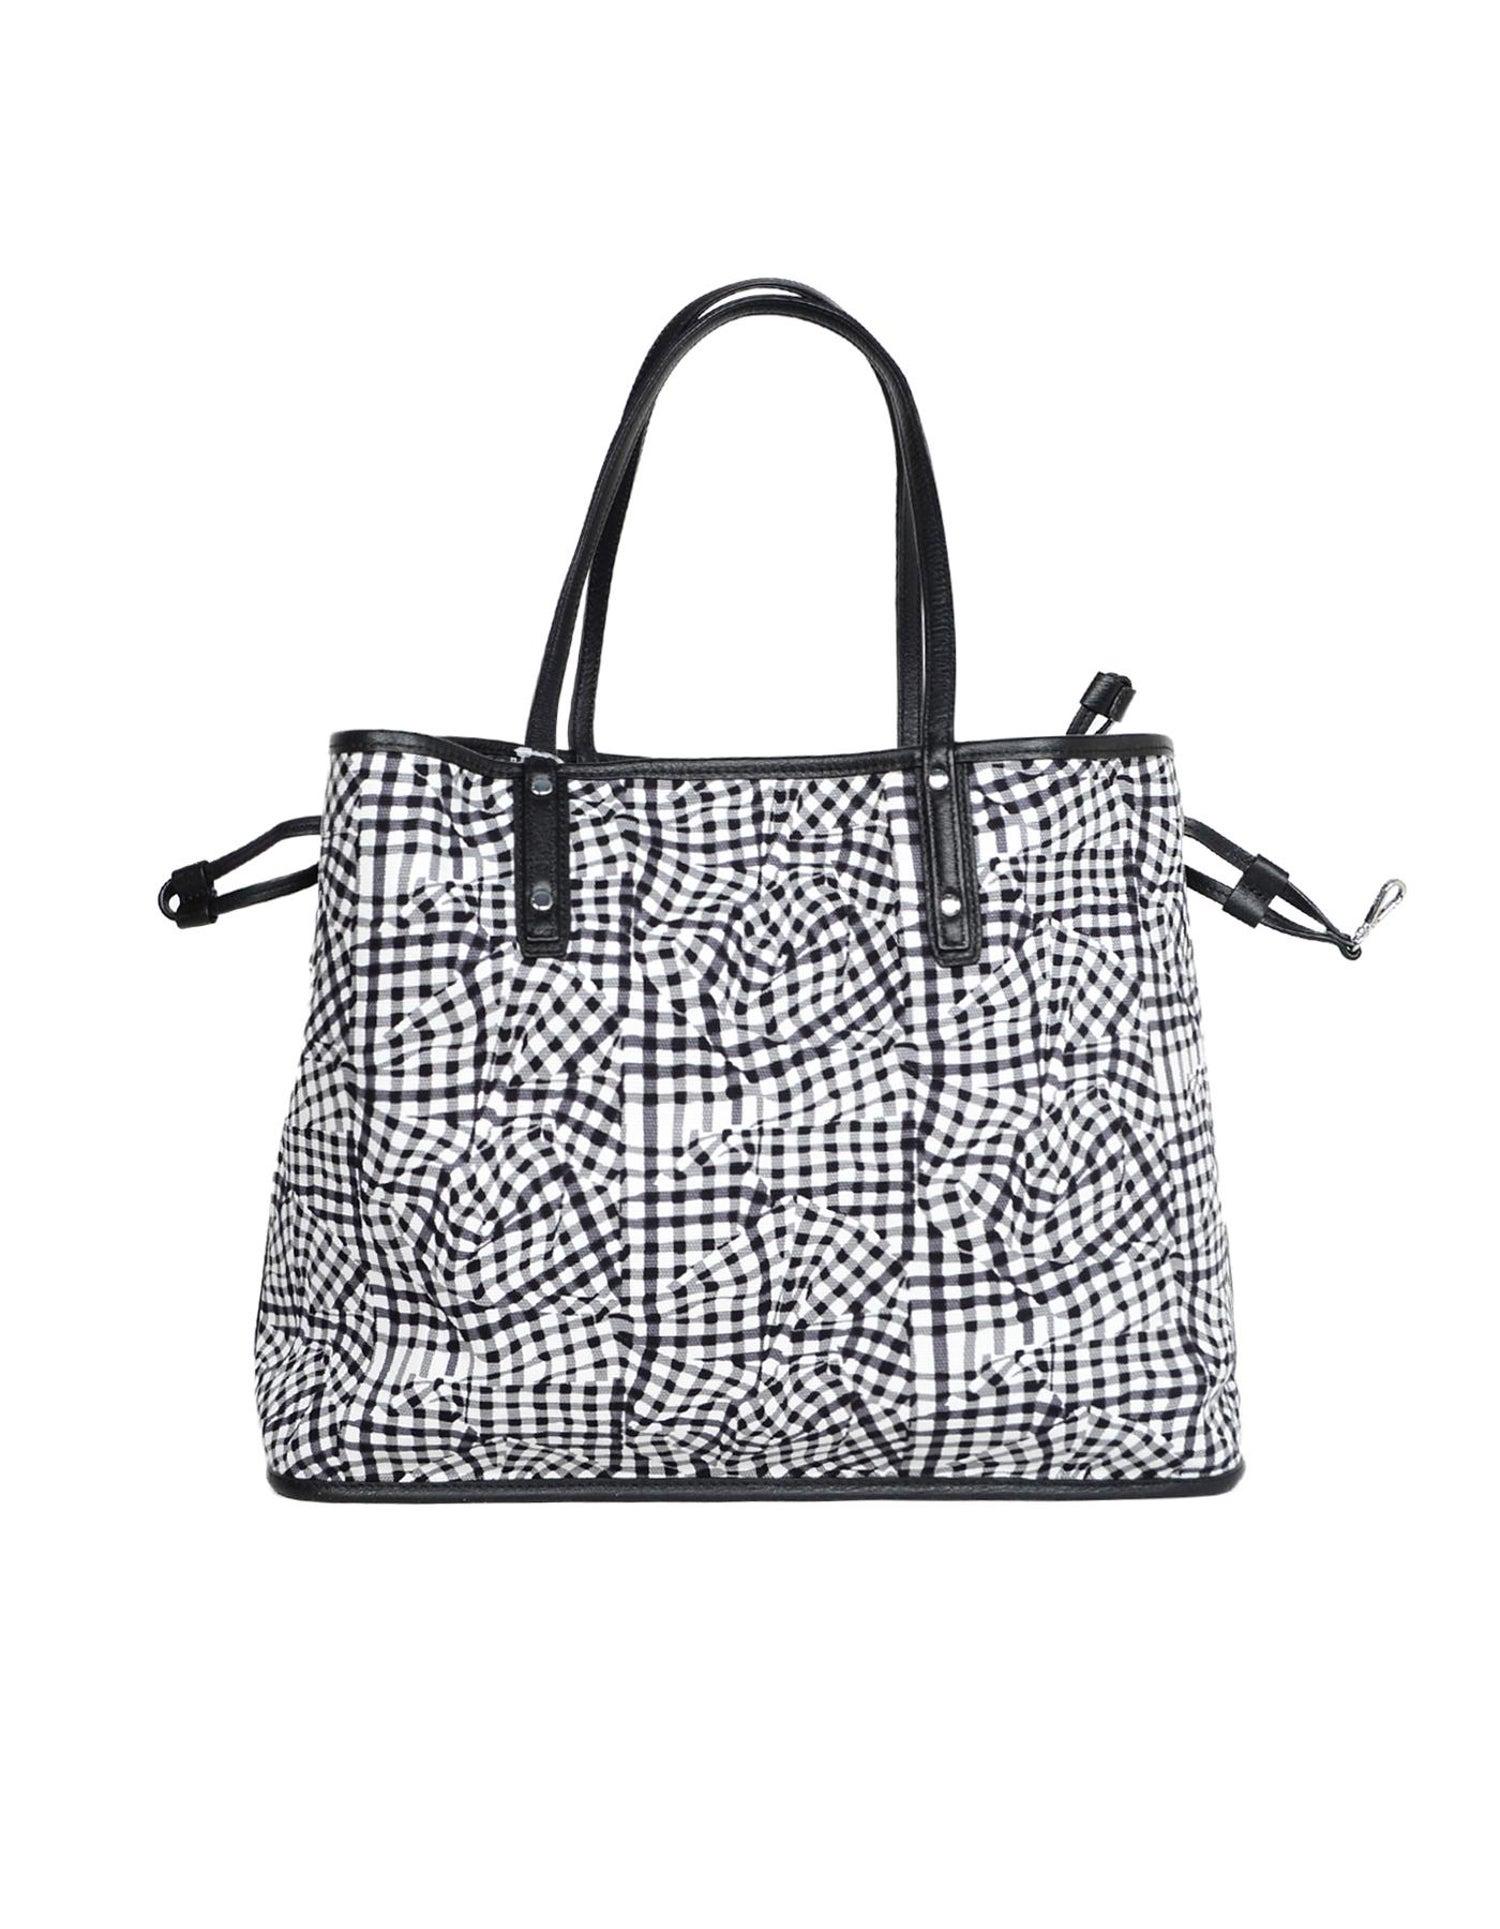 858ed8b46f MCM Black White Monogram Visetos Medium Liz Reversible Shopper Tote Bag For  Sale at 1stdibs